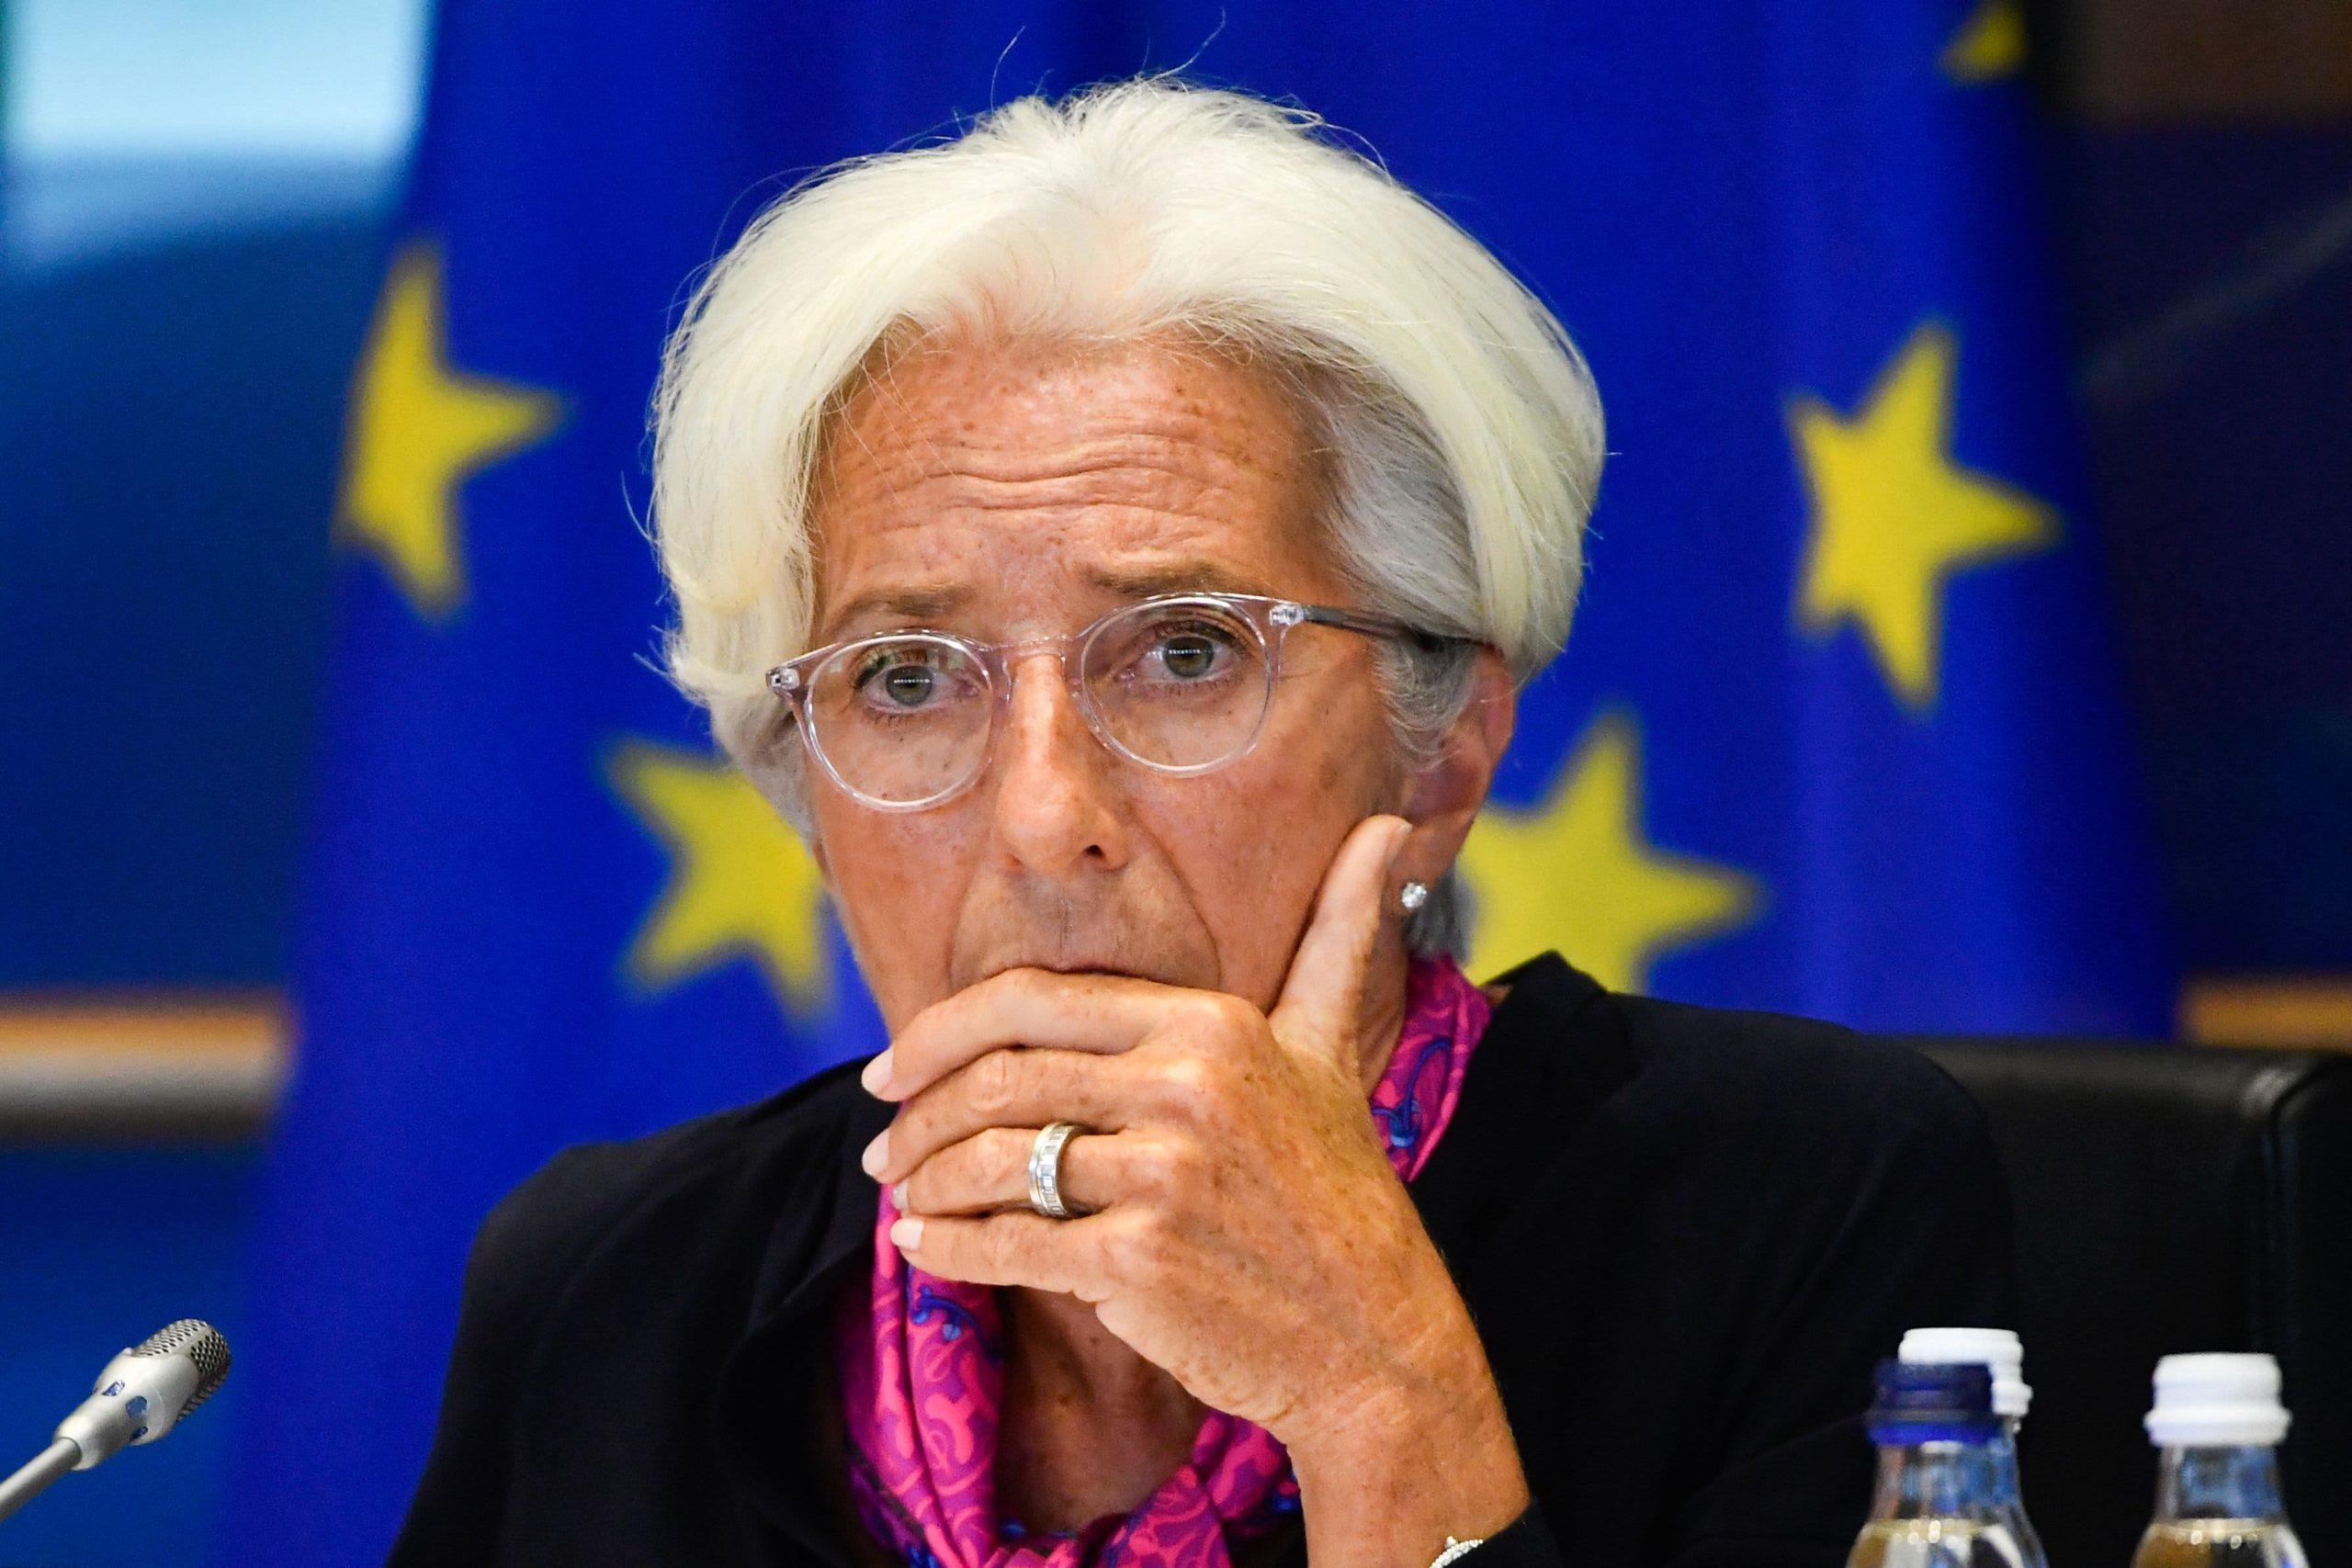 avrupa merkez bankasi baskani lagarde dijital euro hakkinda konustu